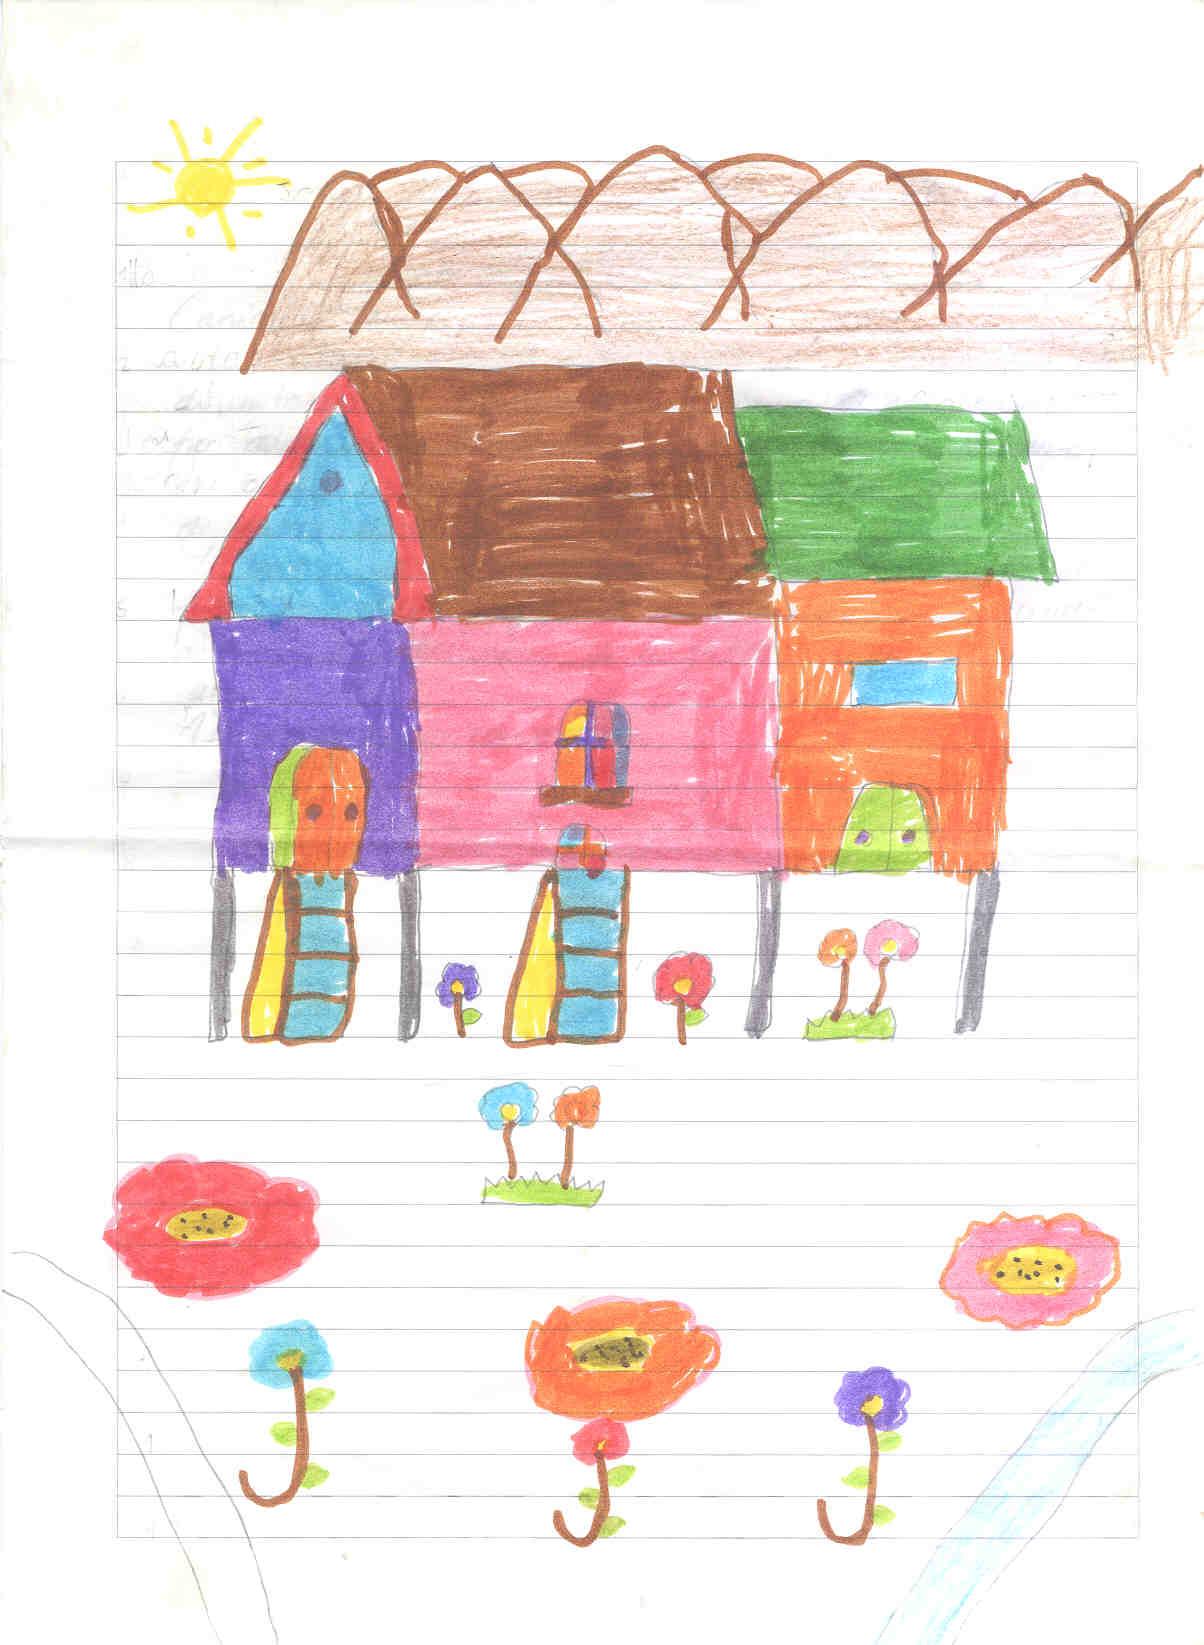 بالصور صور رسومات اطفال , اجمل صور لرسومات الاطفال 5837 5